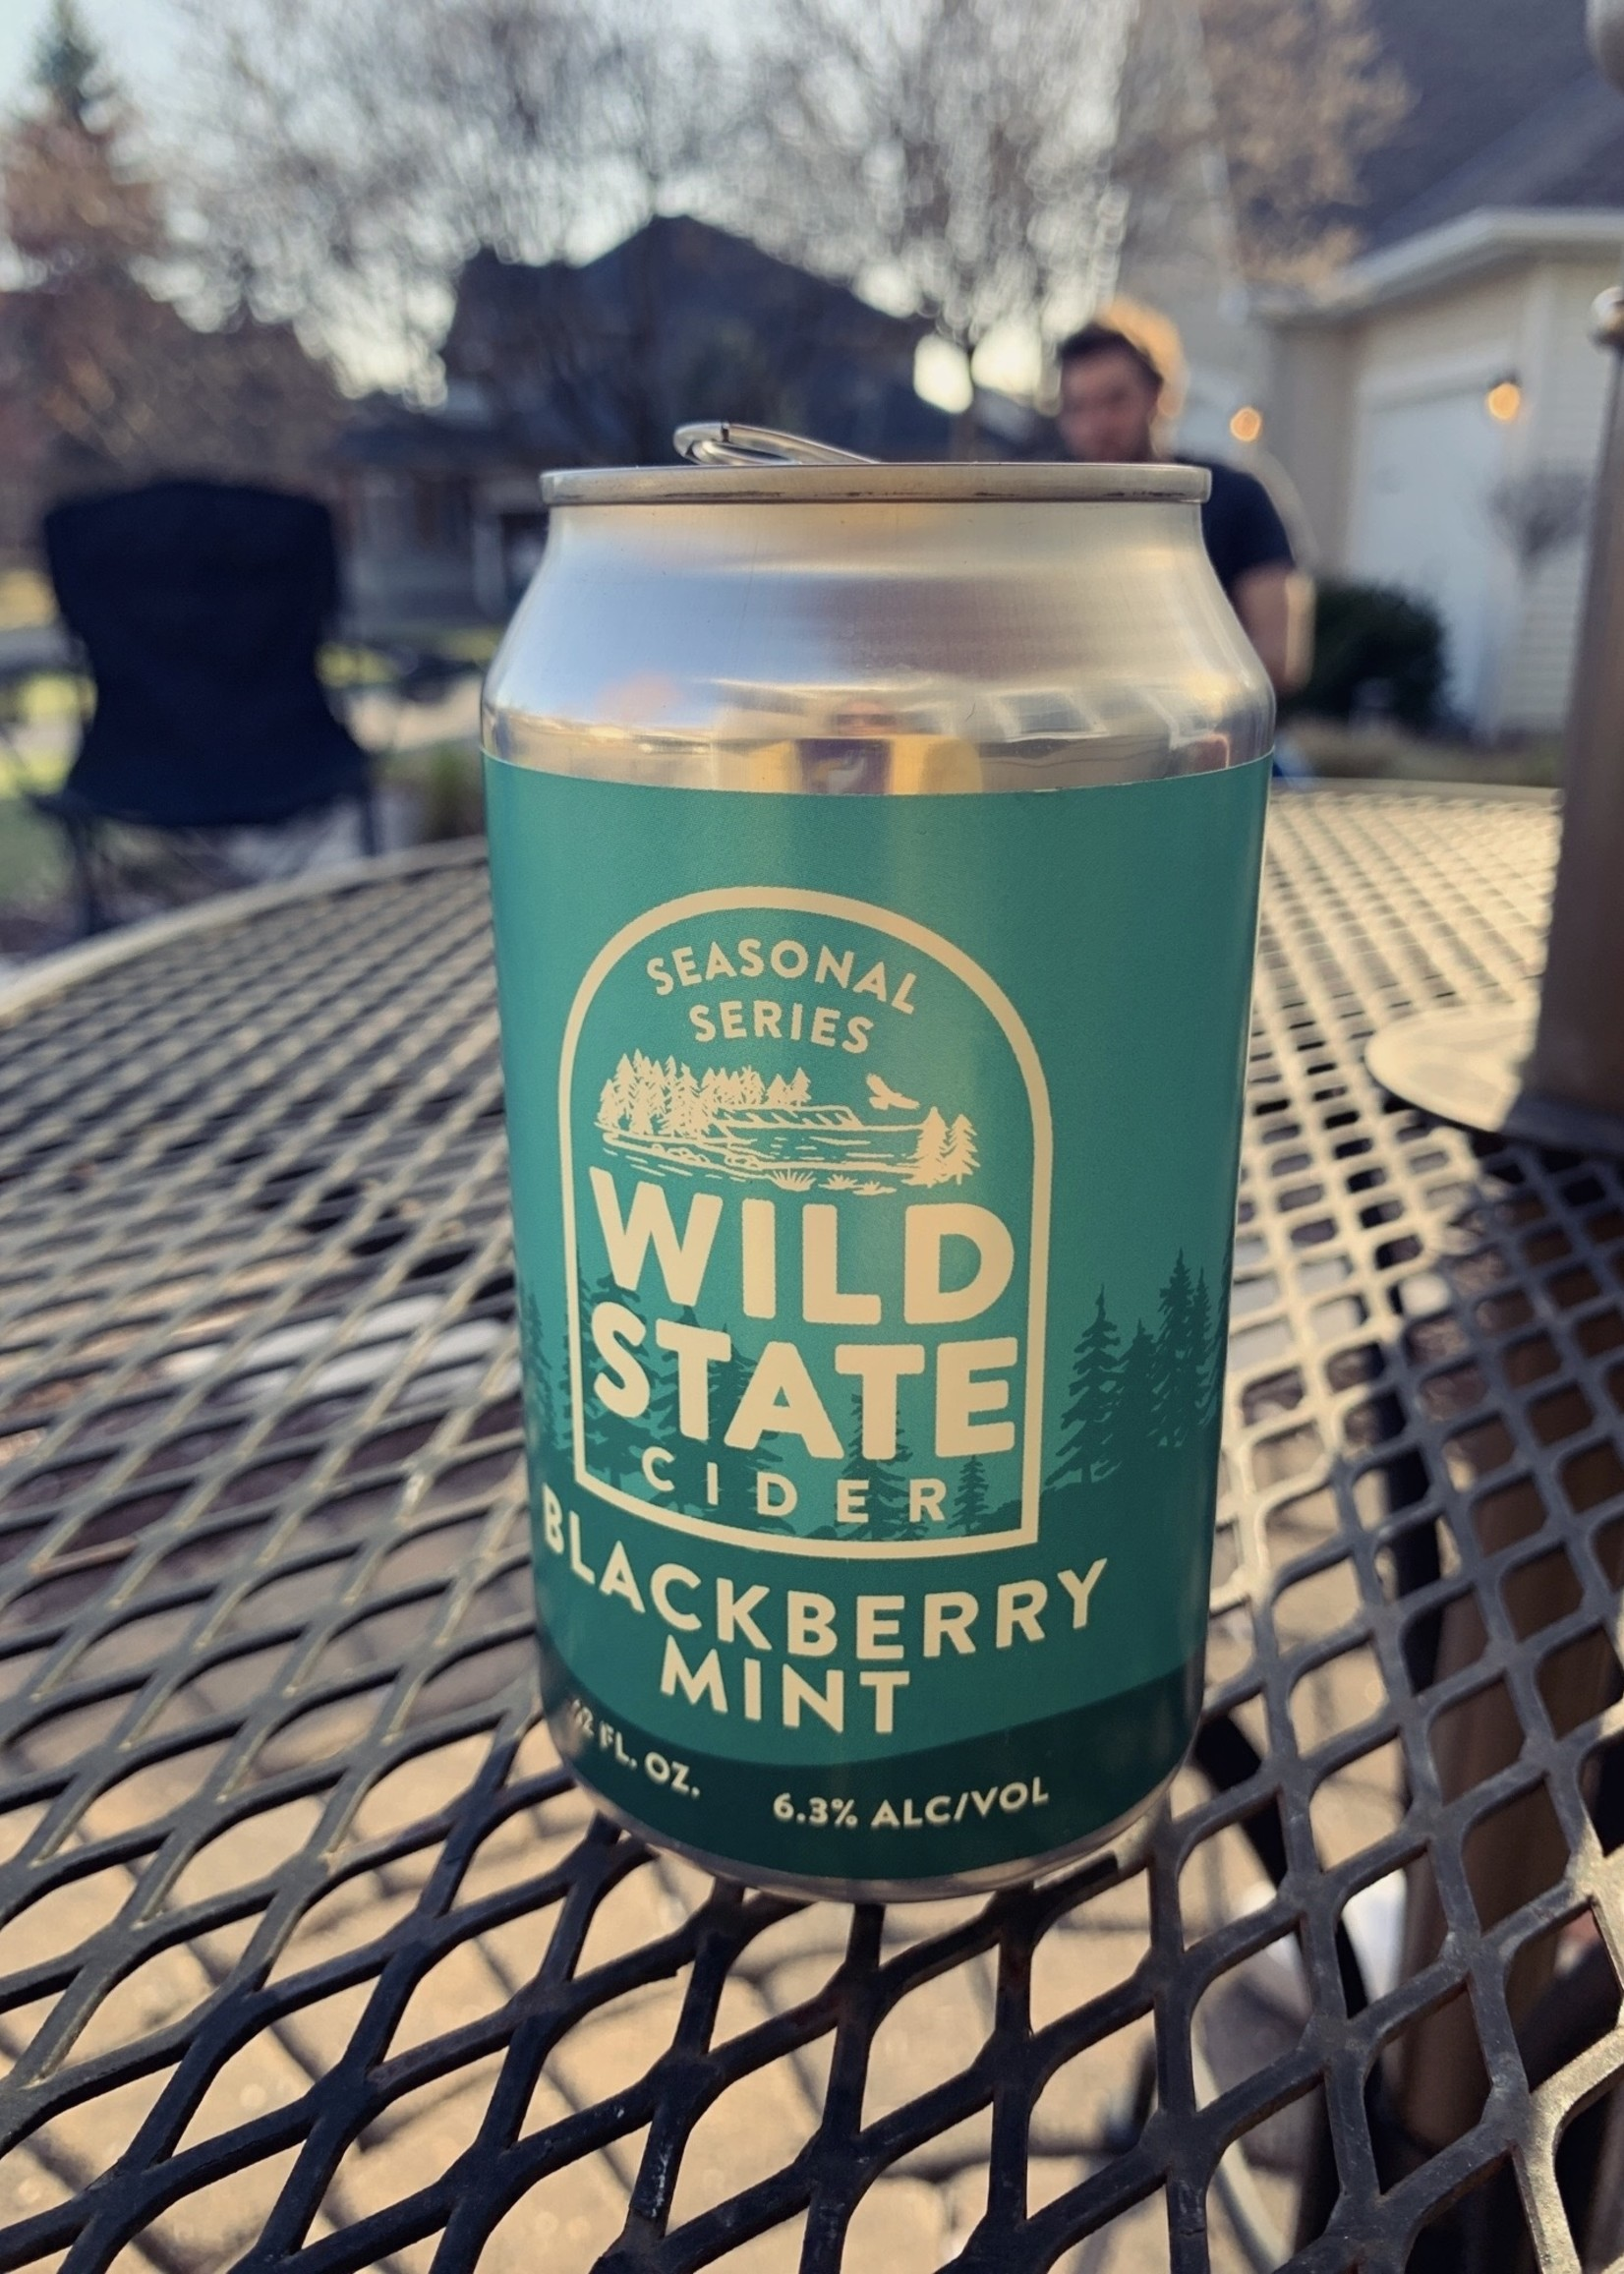 Wild State Blackberry Mint Cider - 4x12oz Cans